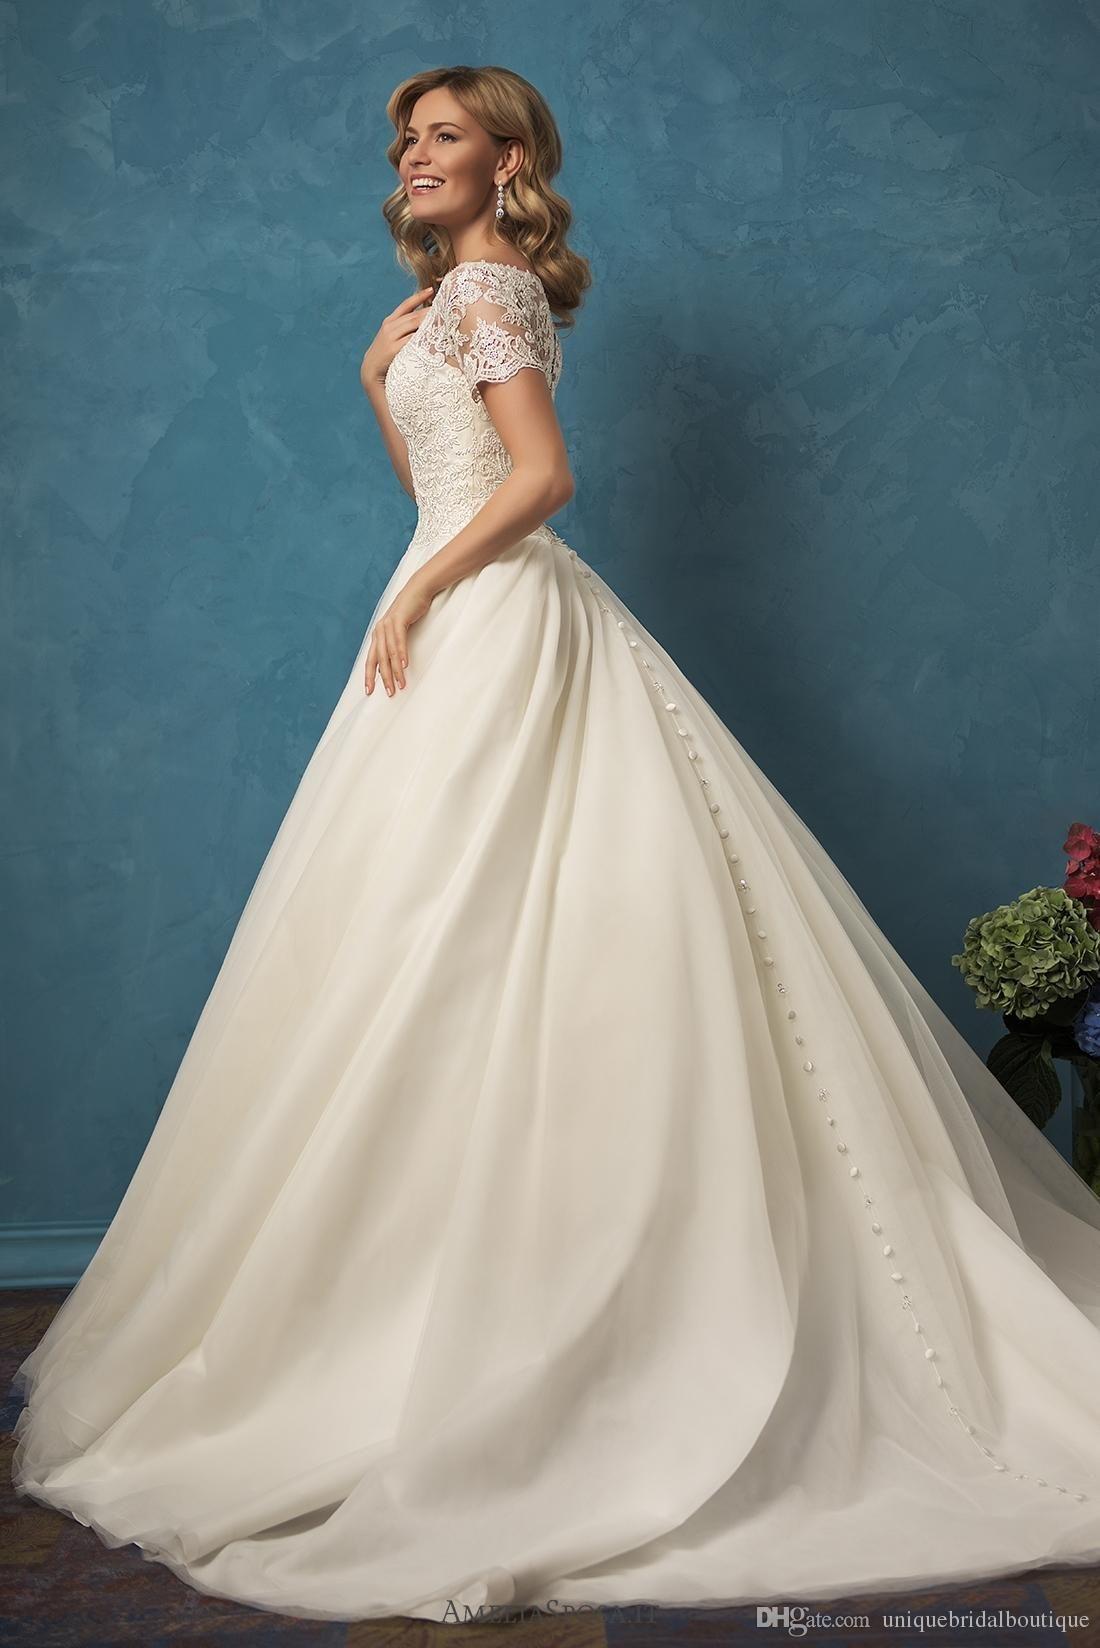 Long sleeve ball gown wedding dresses   Designer Wedding Dresses with Bling Bling Bodice and Ruffles